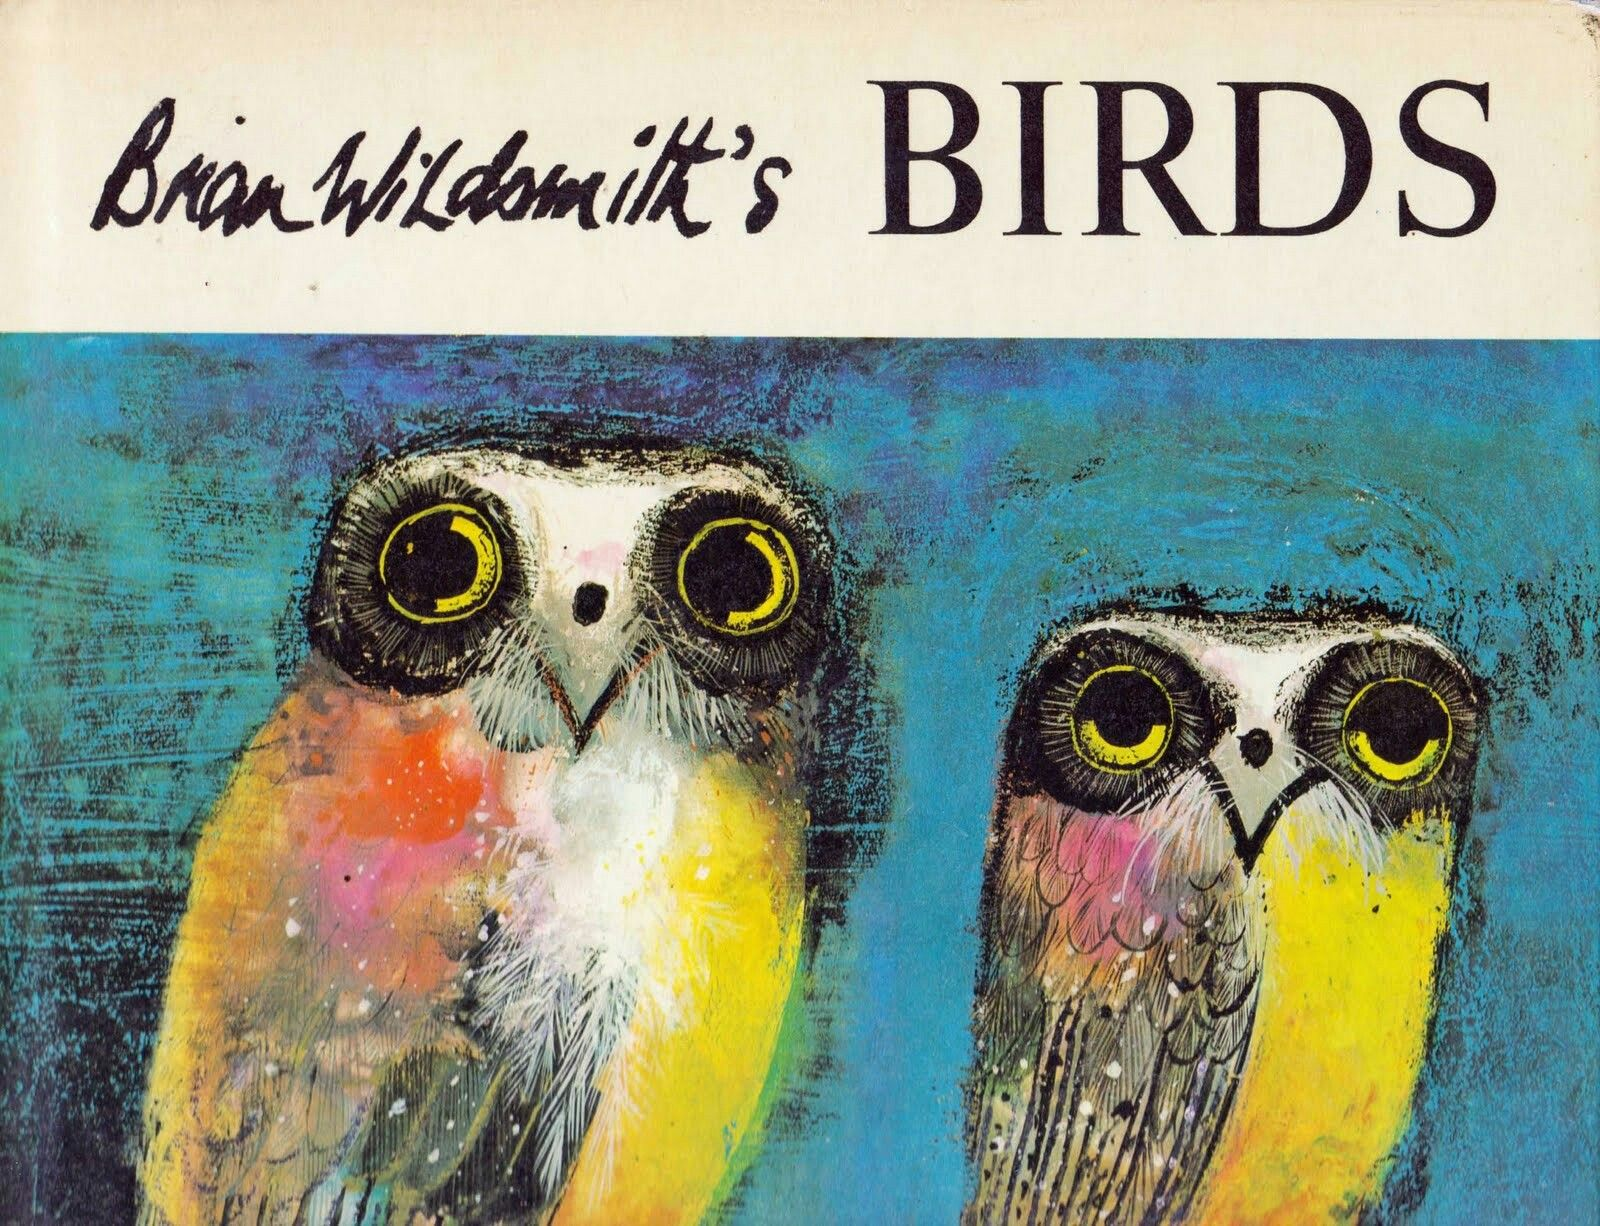 Watercolor books for kids - Explore Kid Books Childrens Books And More